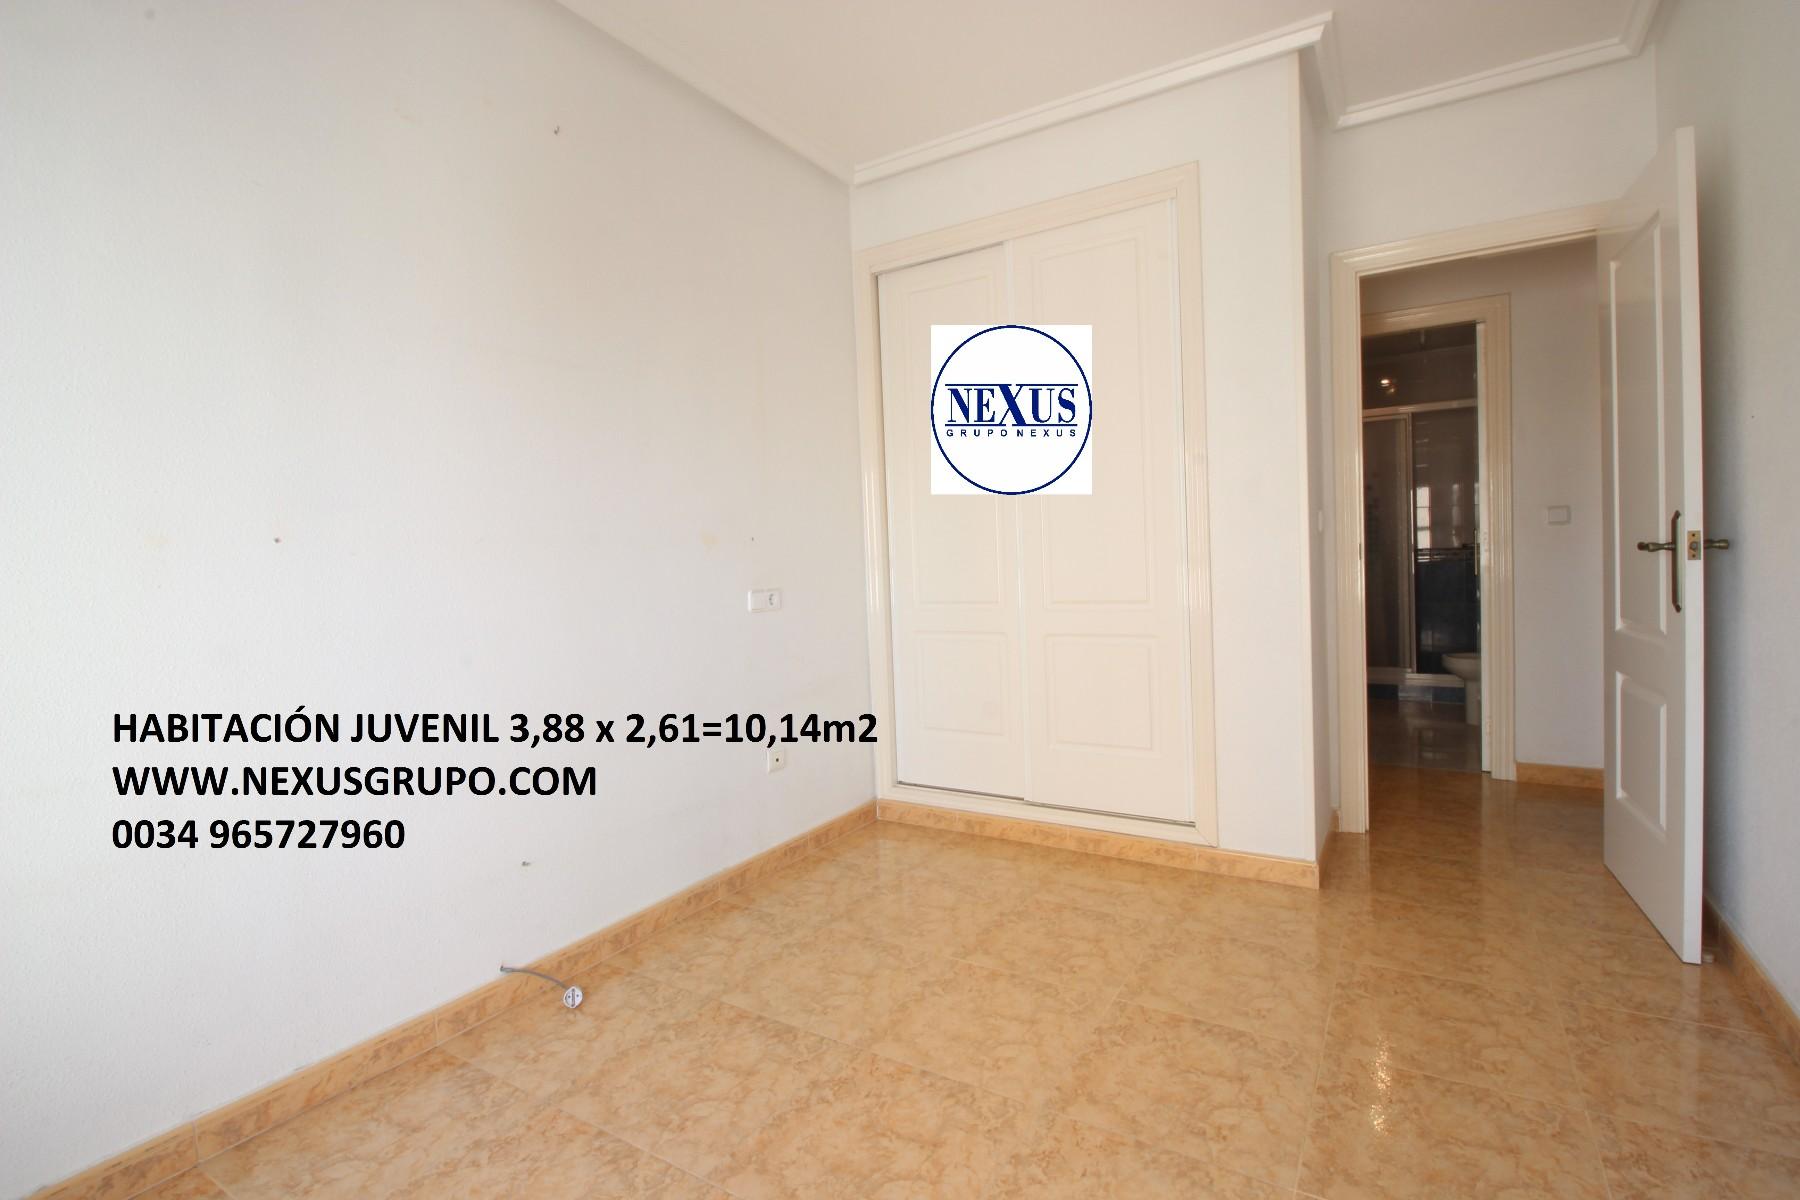 Grupo Nexus Real Estate Agency sells an apartment close to Mas y Mas supermarket. in Nexus Grupo